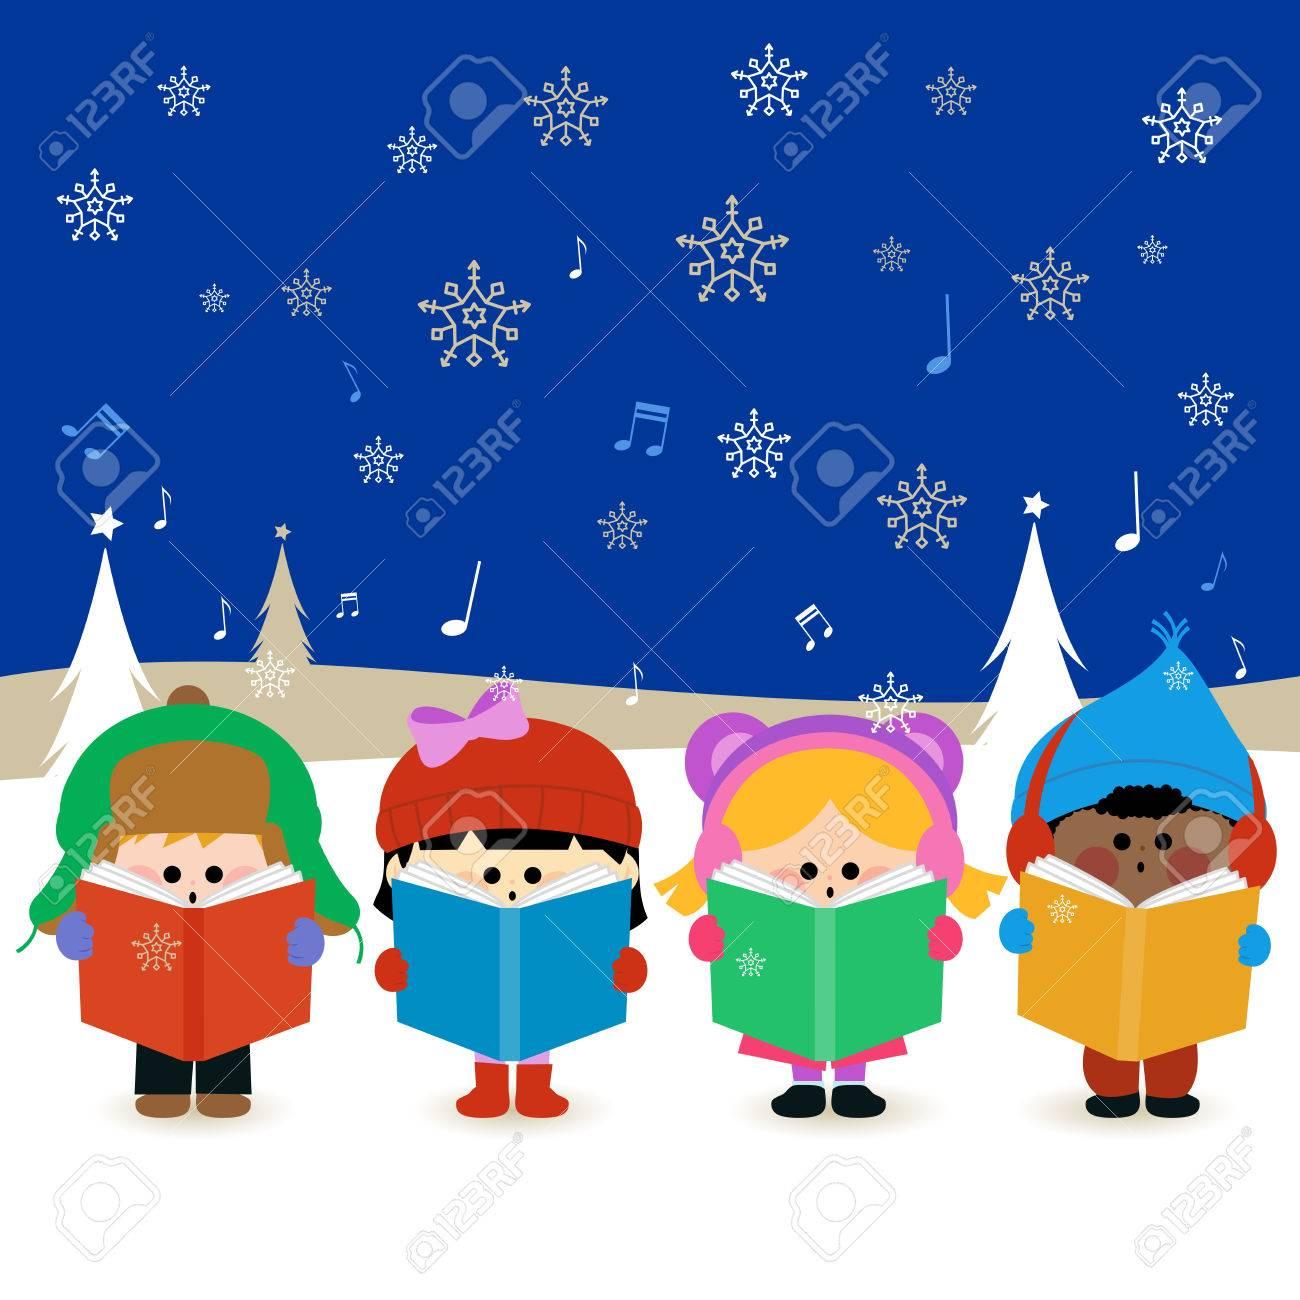 Group of children singing Christmas carols - 46487661